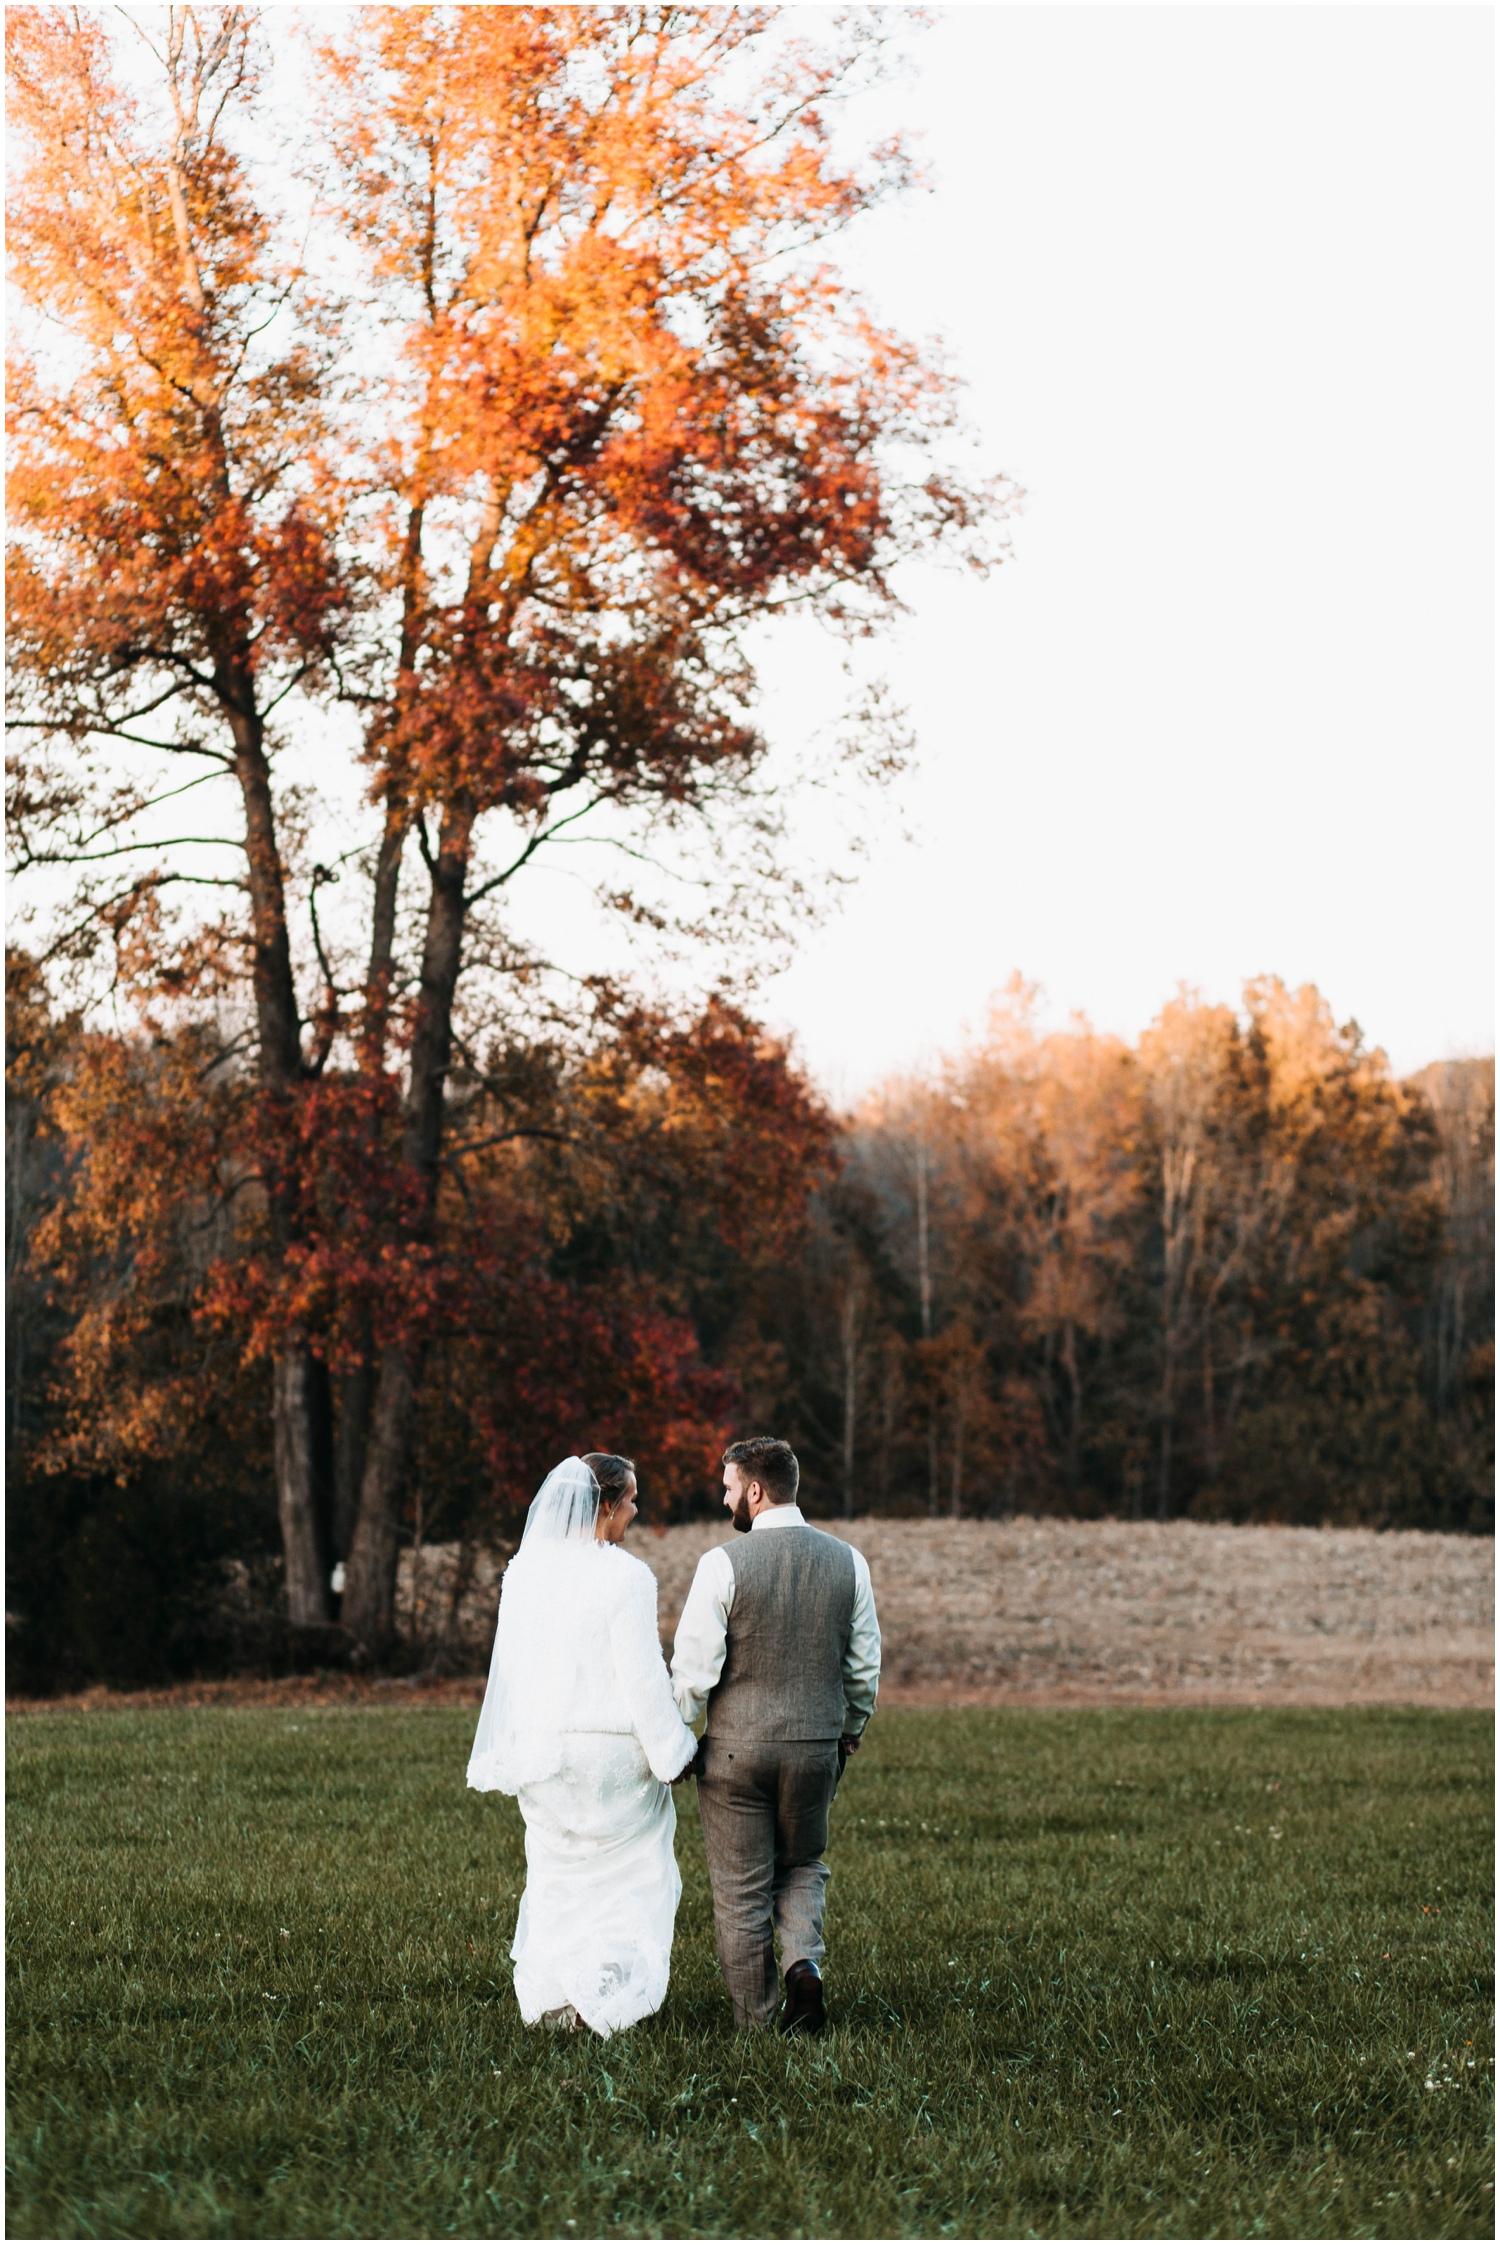 Jess+Dan_rustic_southern_farm_fall_wedding_charlotte_north carolina_taylor powers_0203.jpg